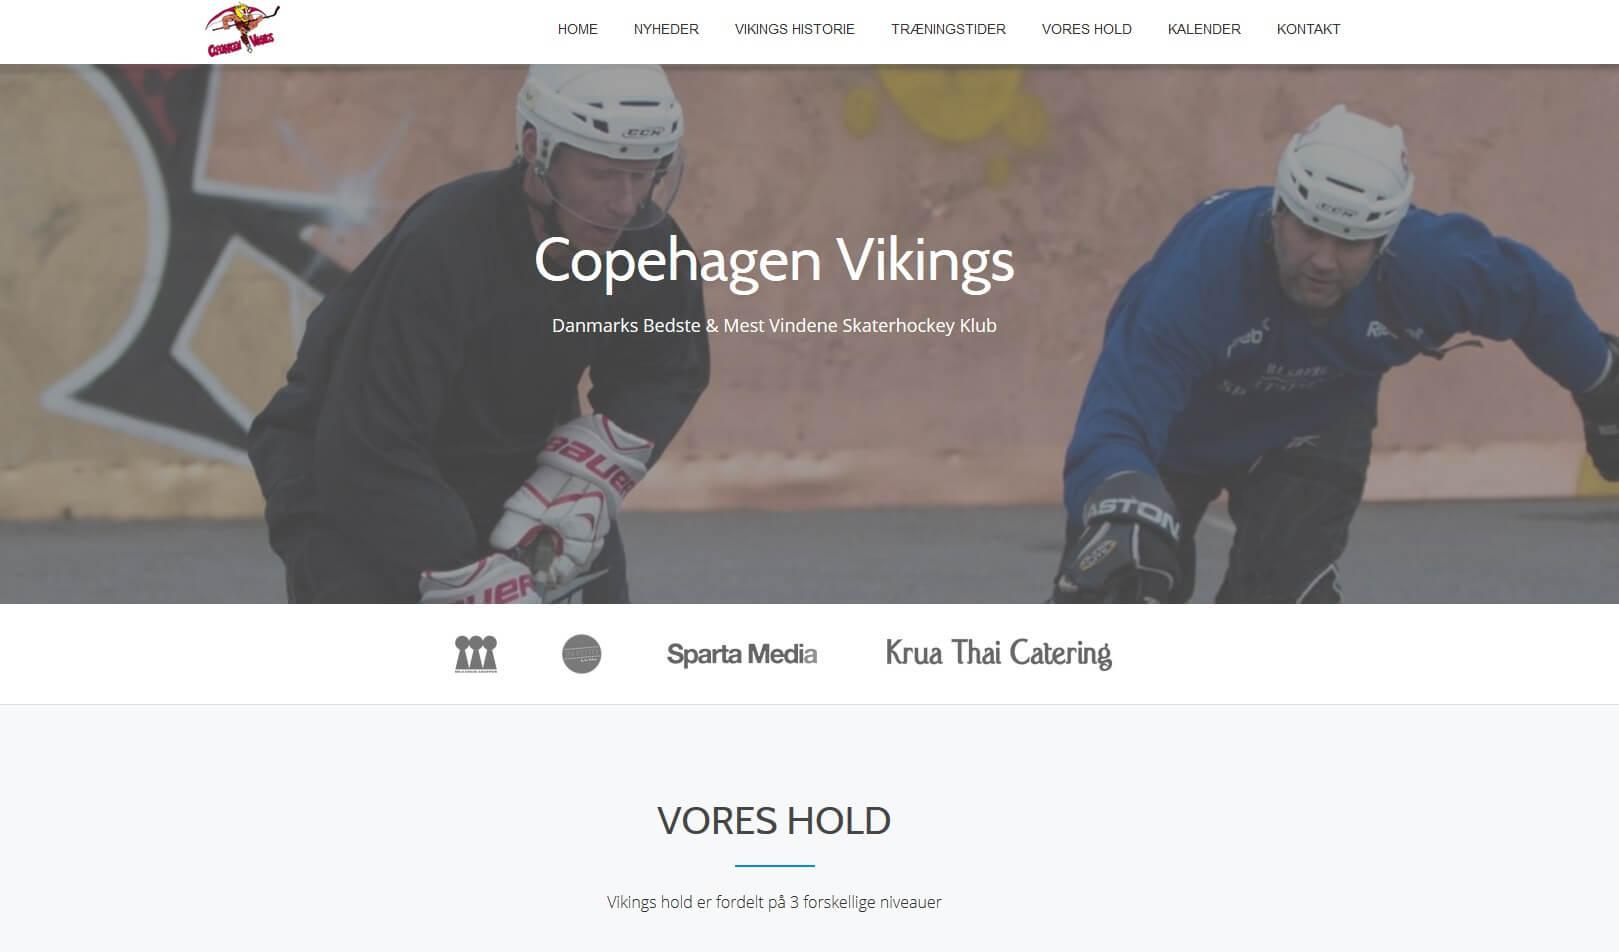 Copenhagen Vikings